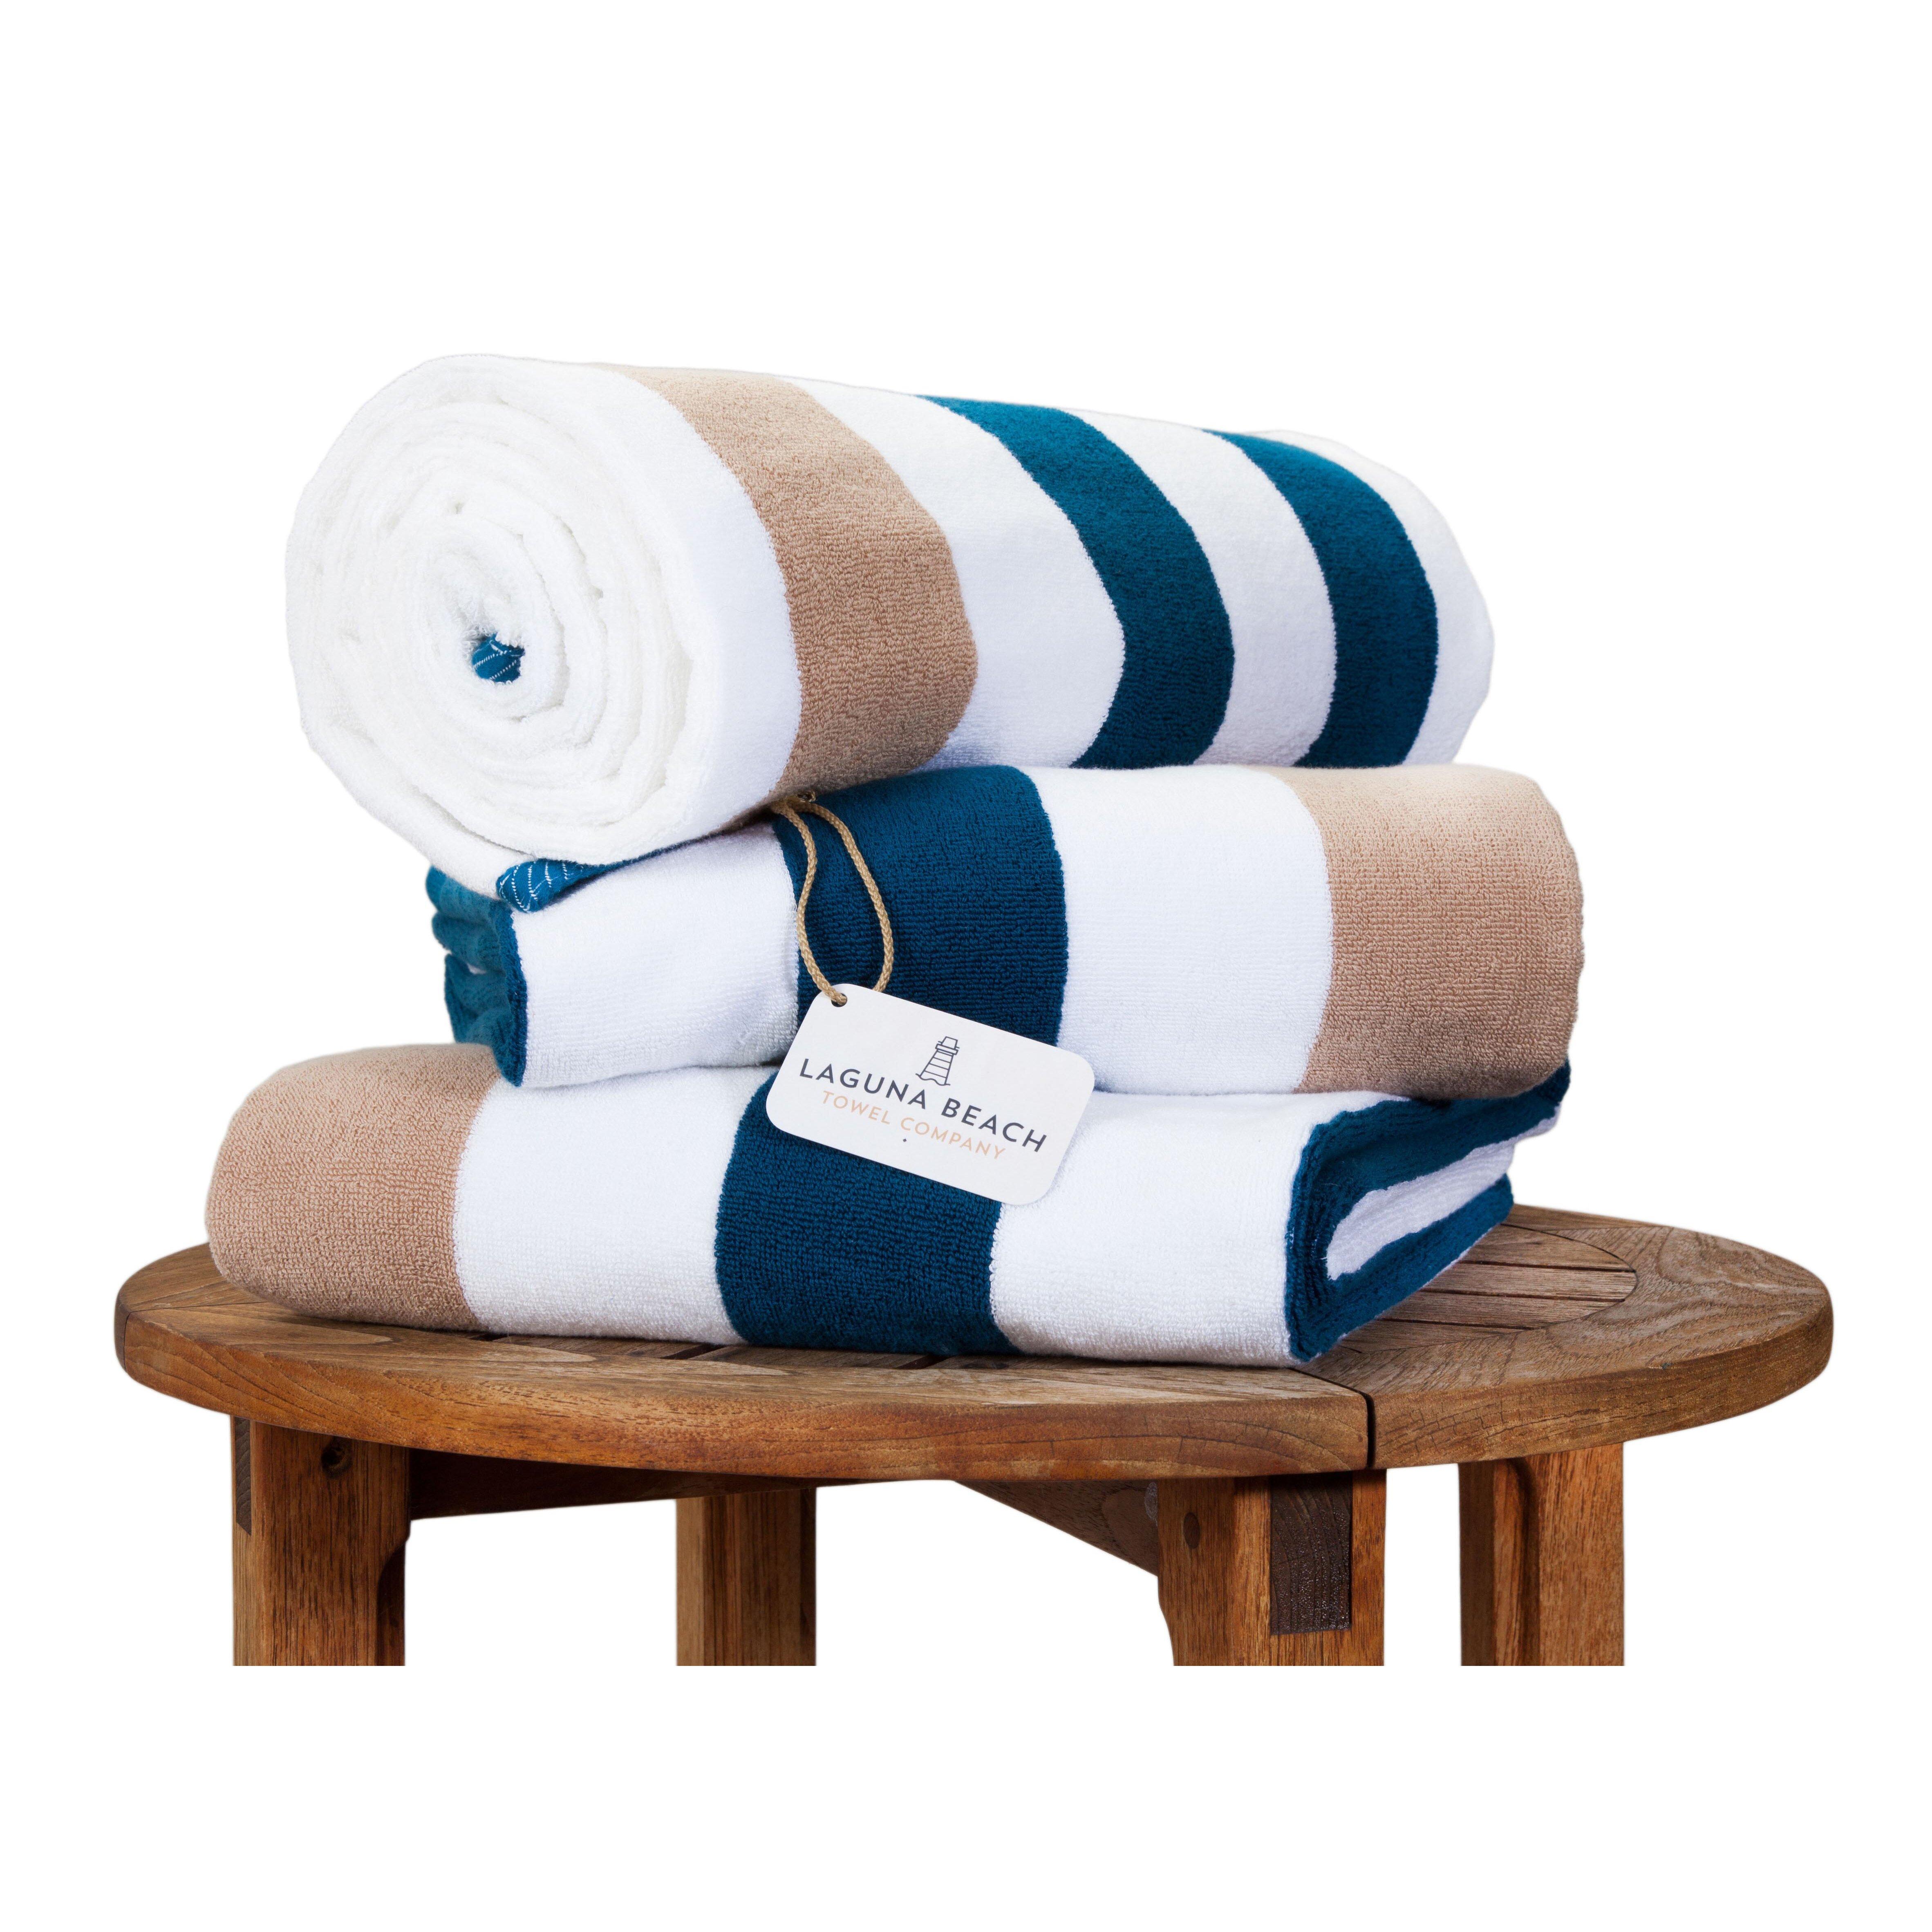 Beach Towel: Laguna Beach Towel Company Plush Cabana Beach Towel